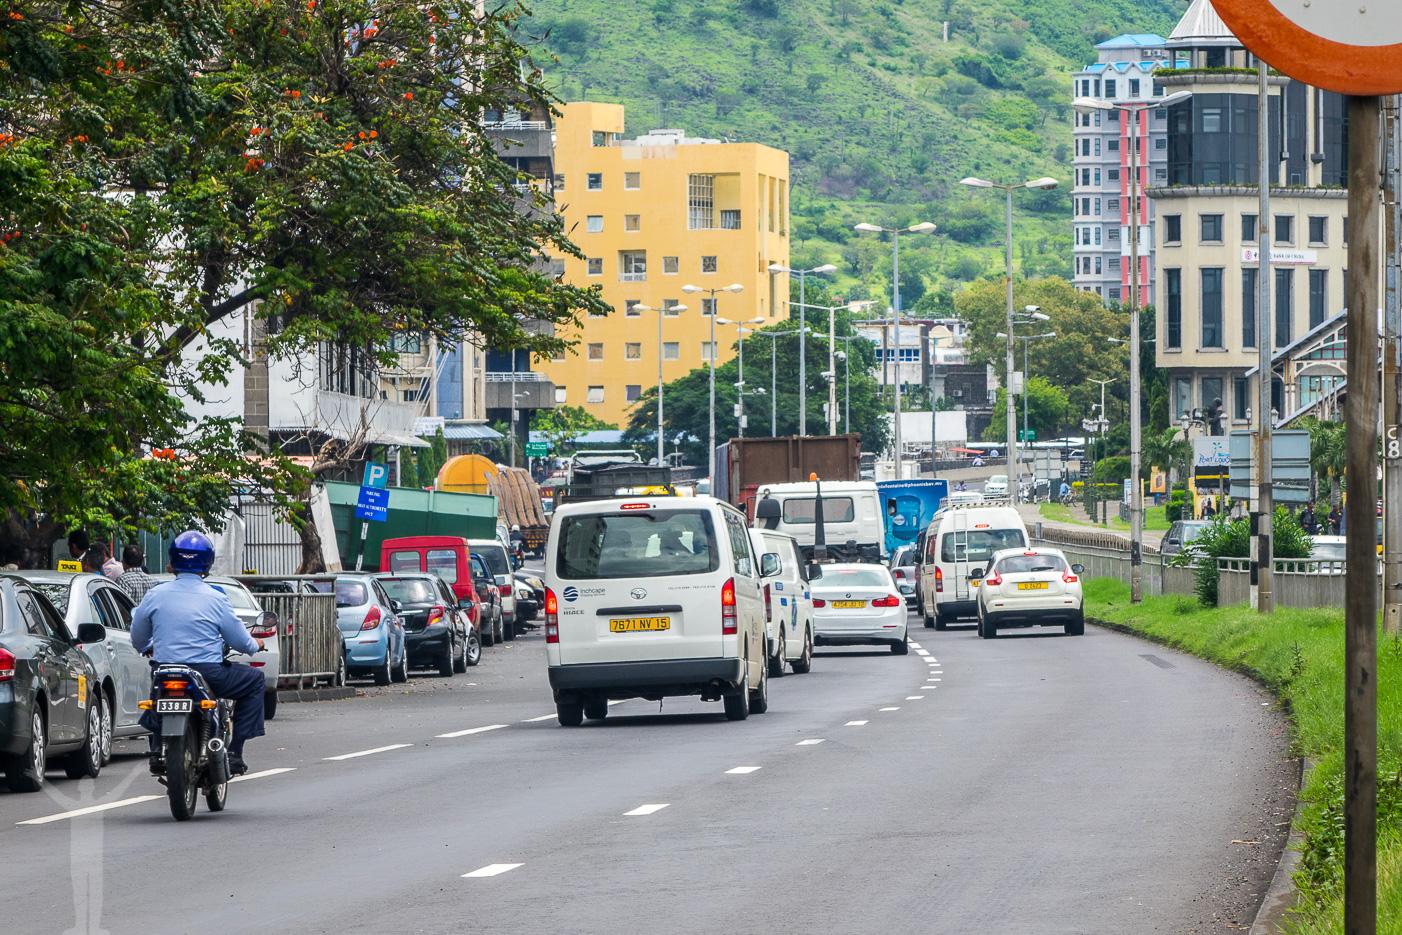 Trafik i Port Louis